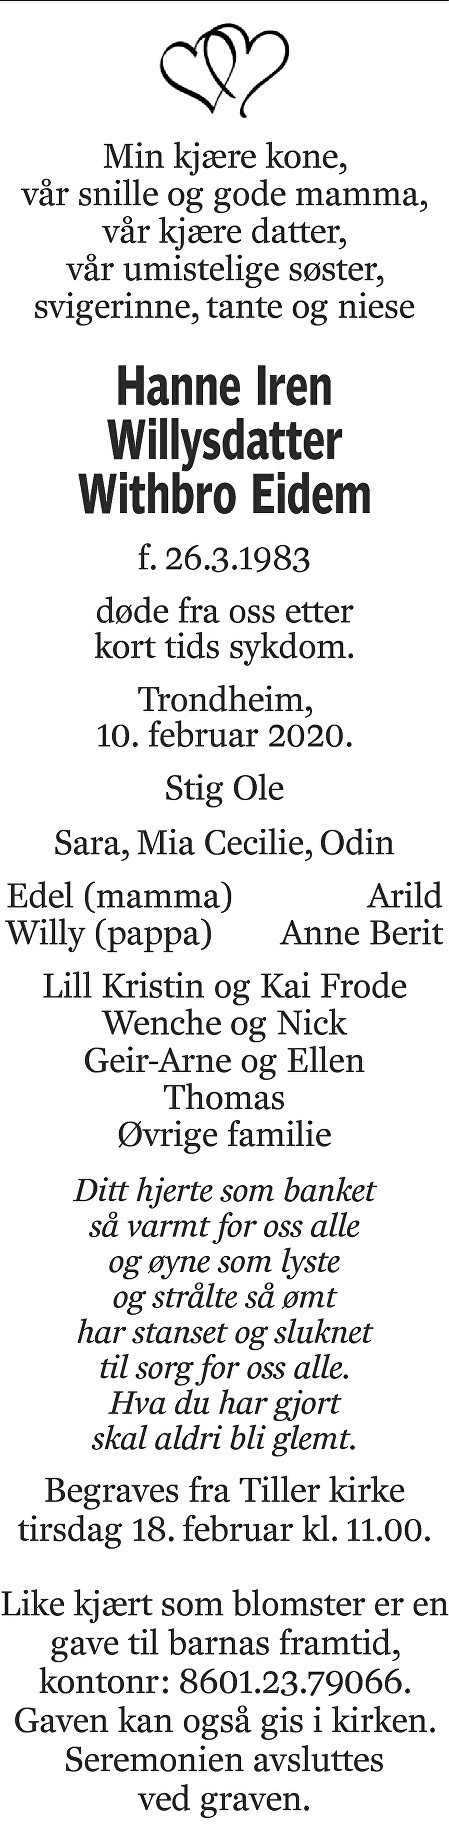 Hanne Iren Willysdatter Withbro Eidem Dødsannonse